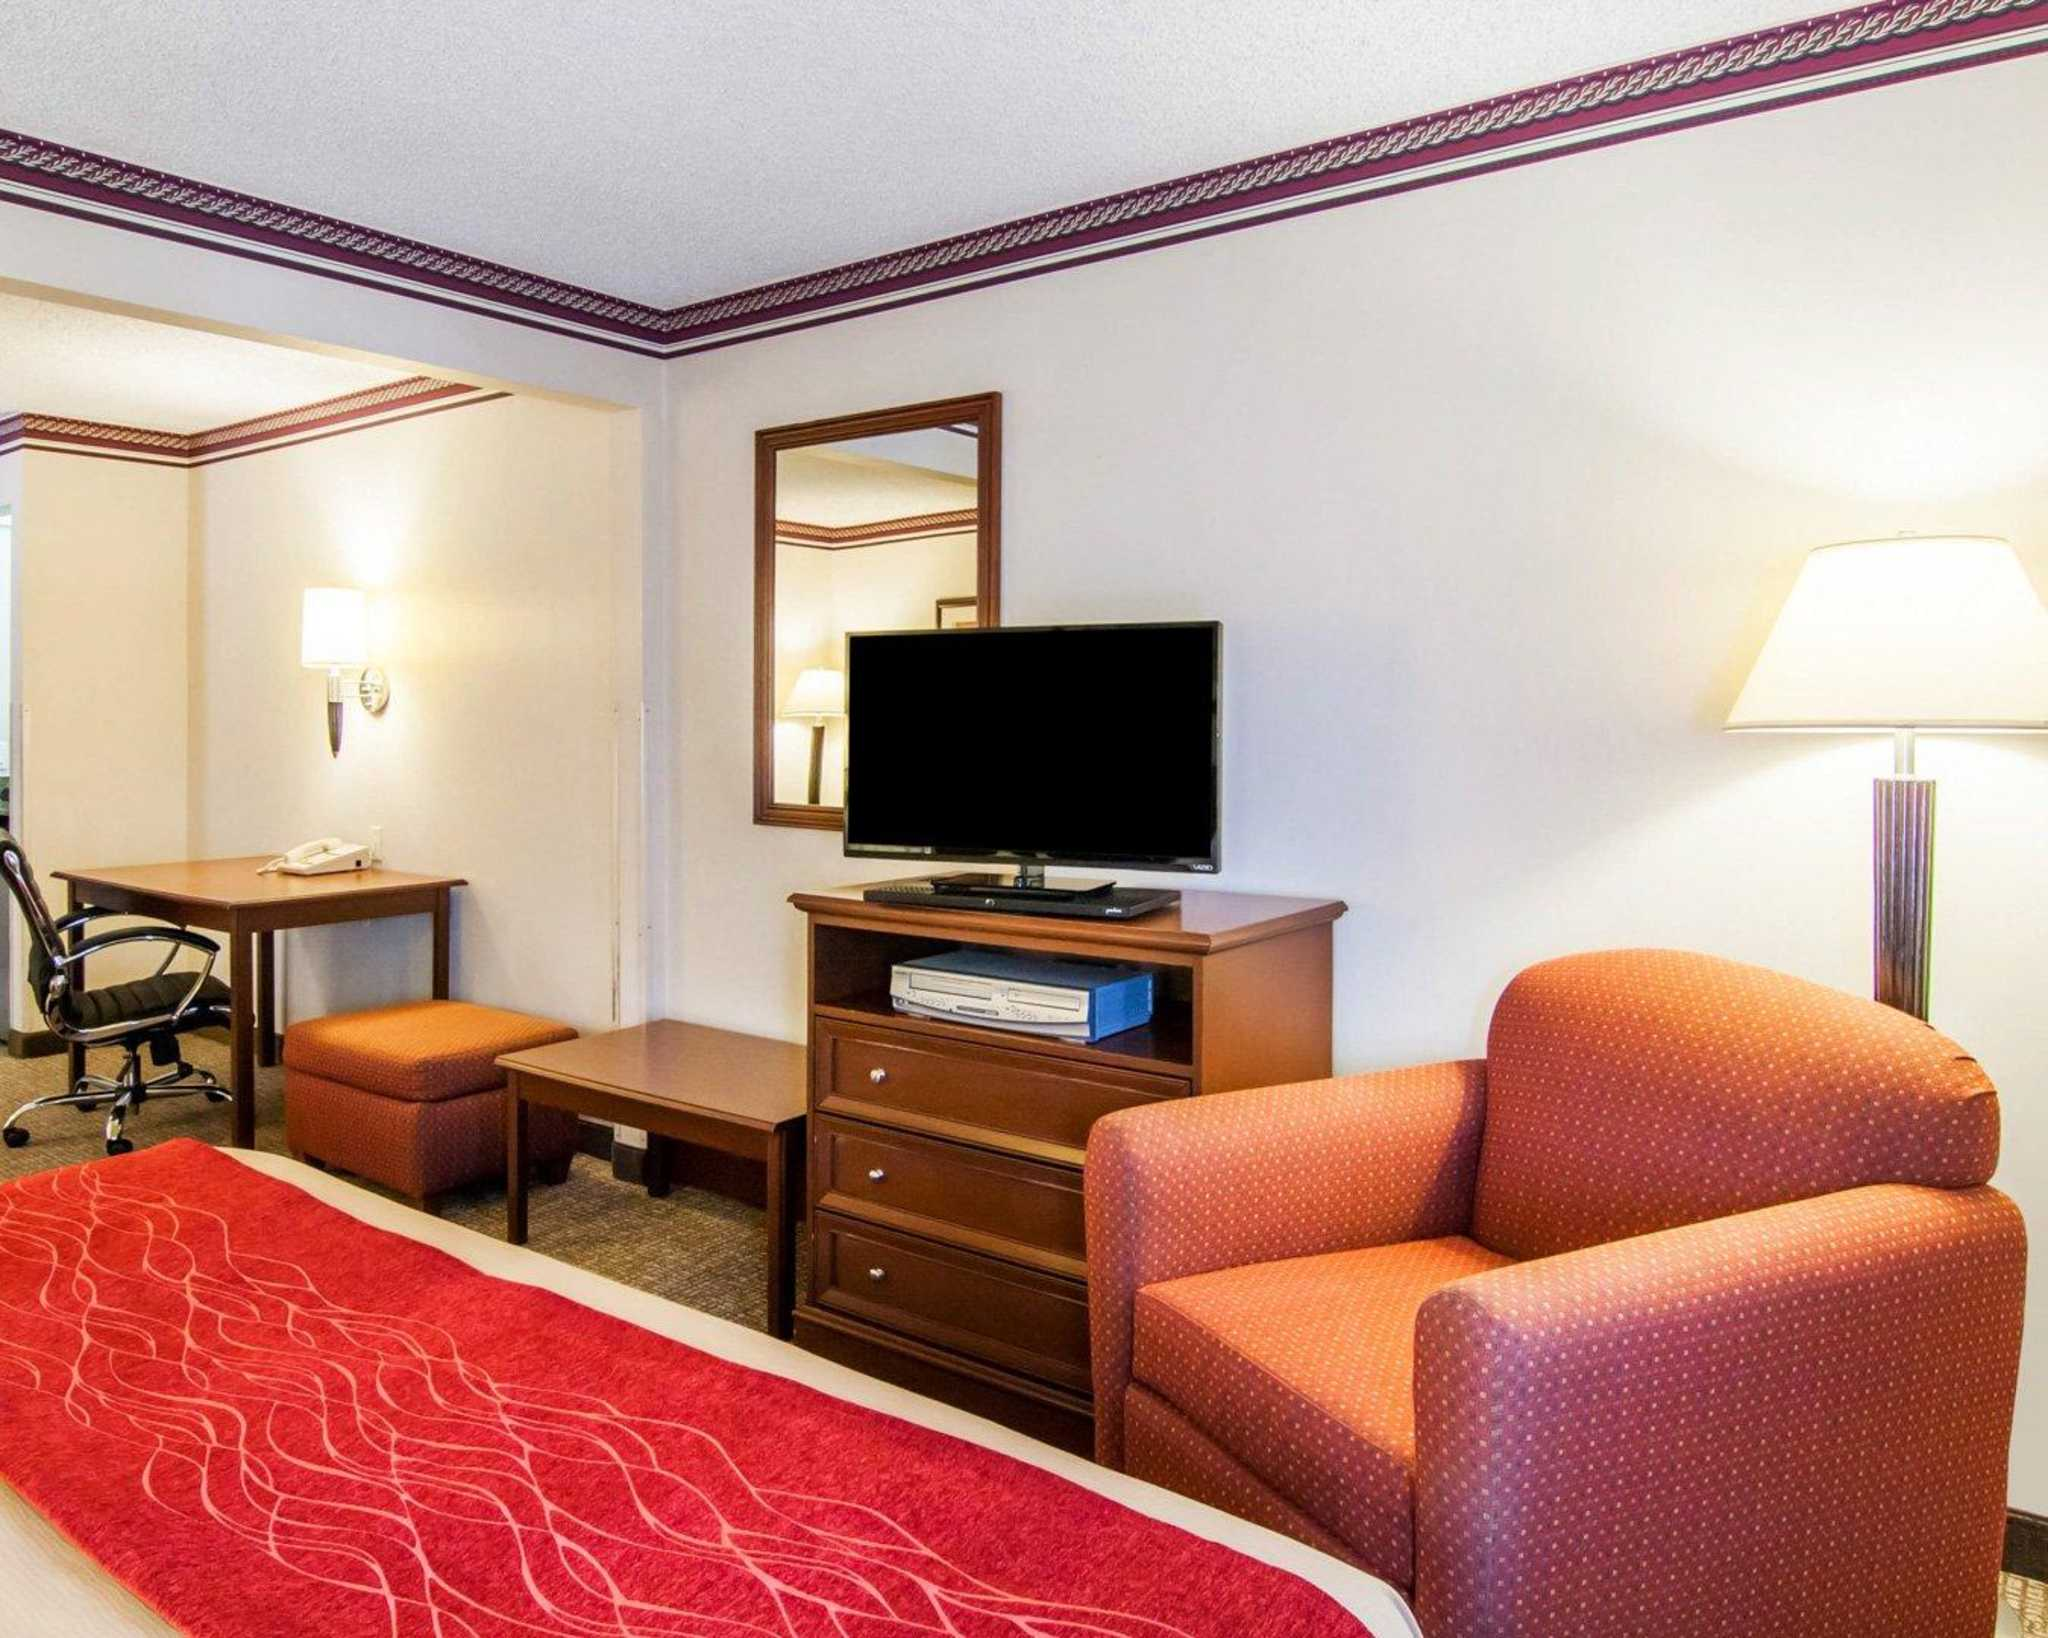 Comfort Inn North image 27